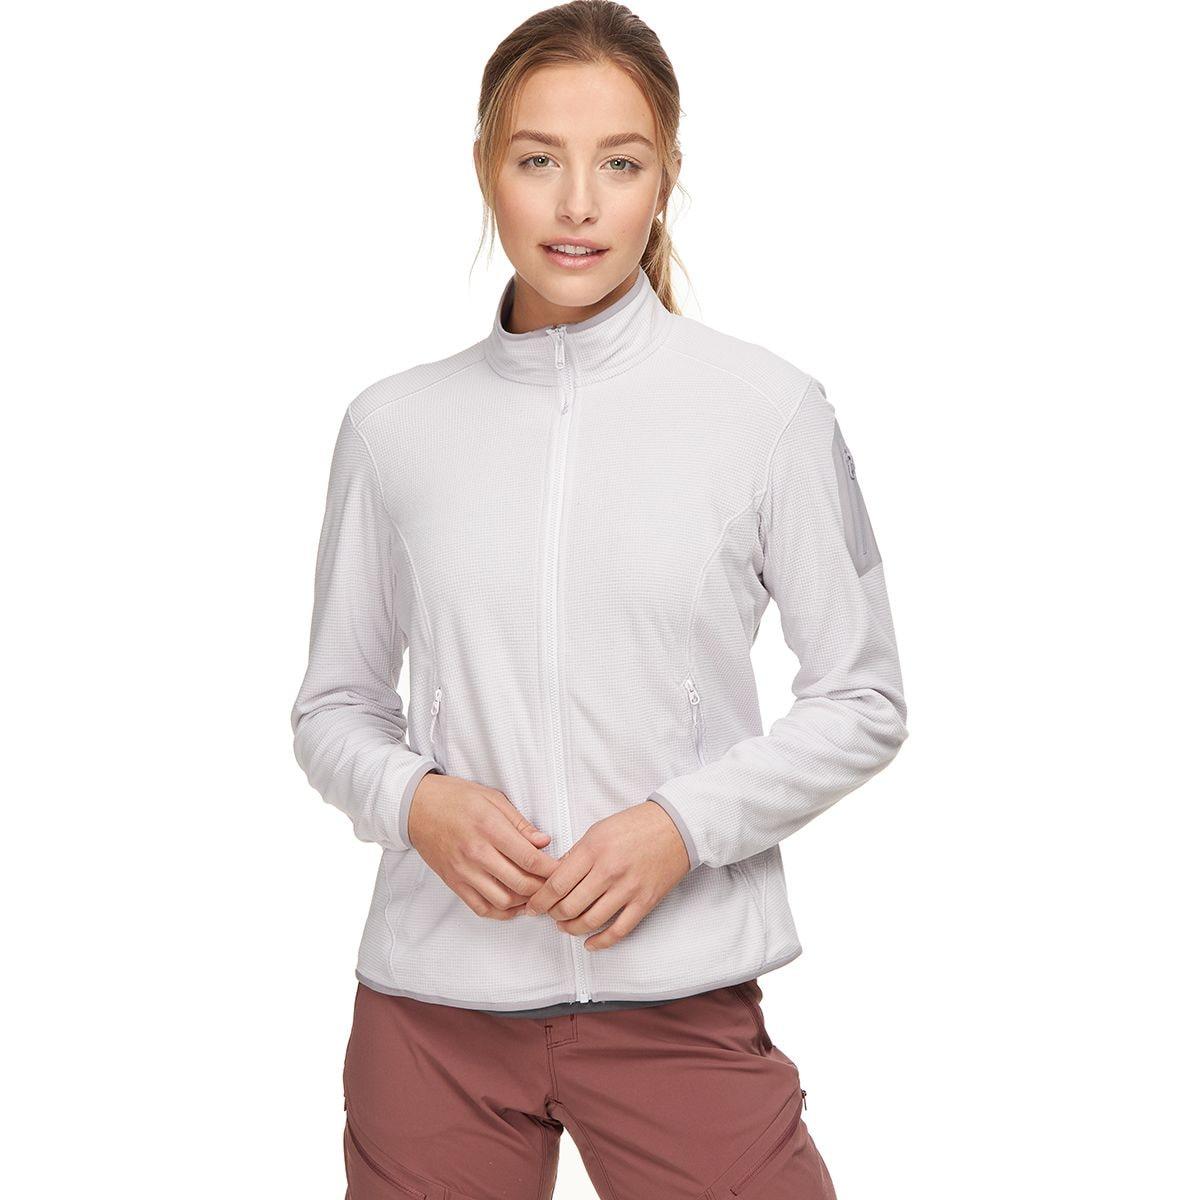 Delta LT Fleece Jacket - Women